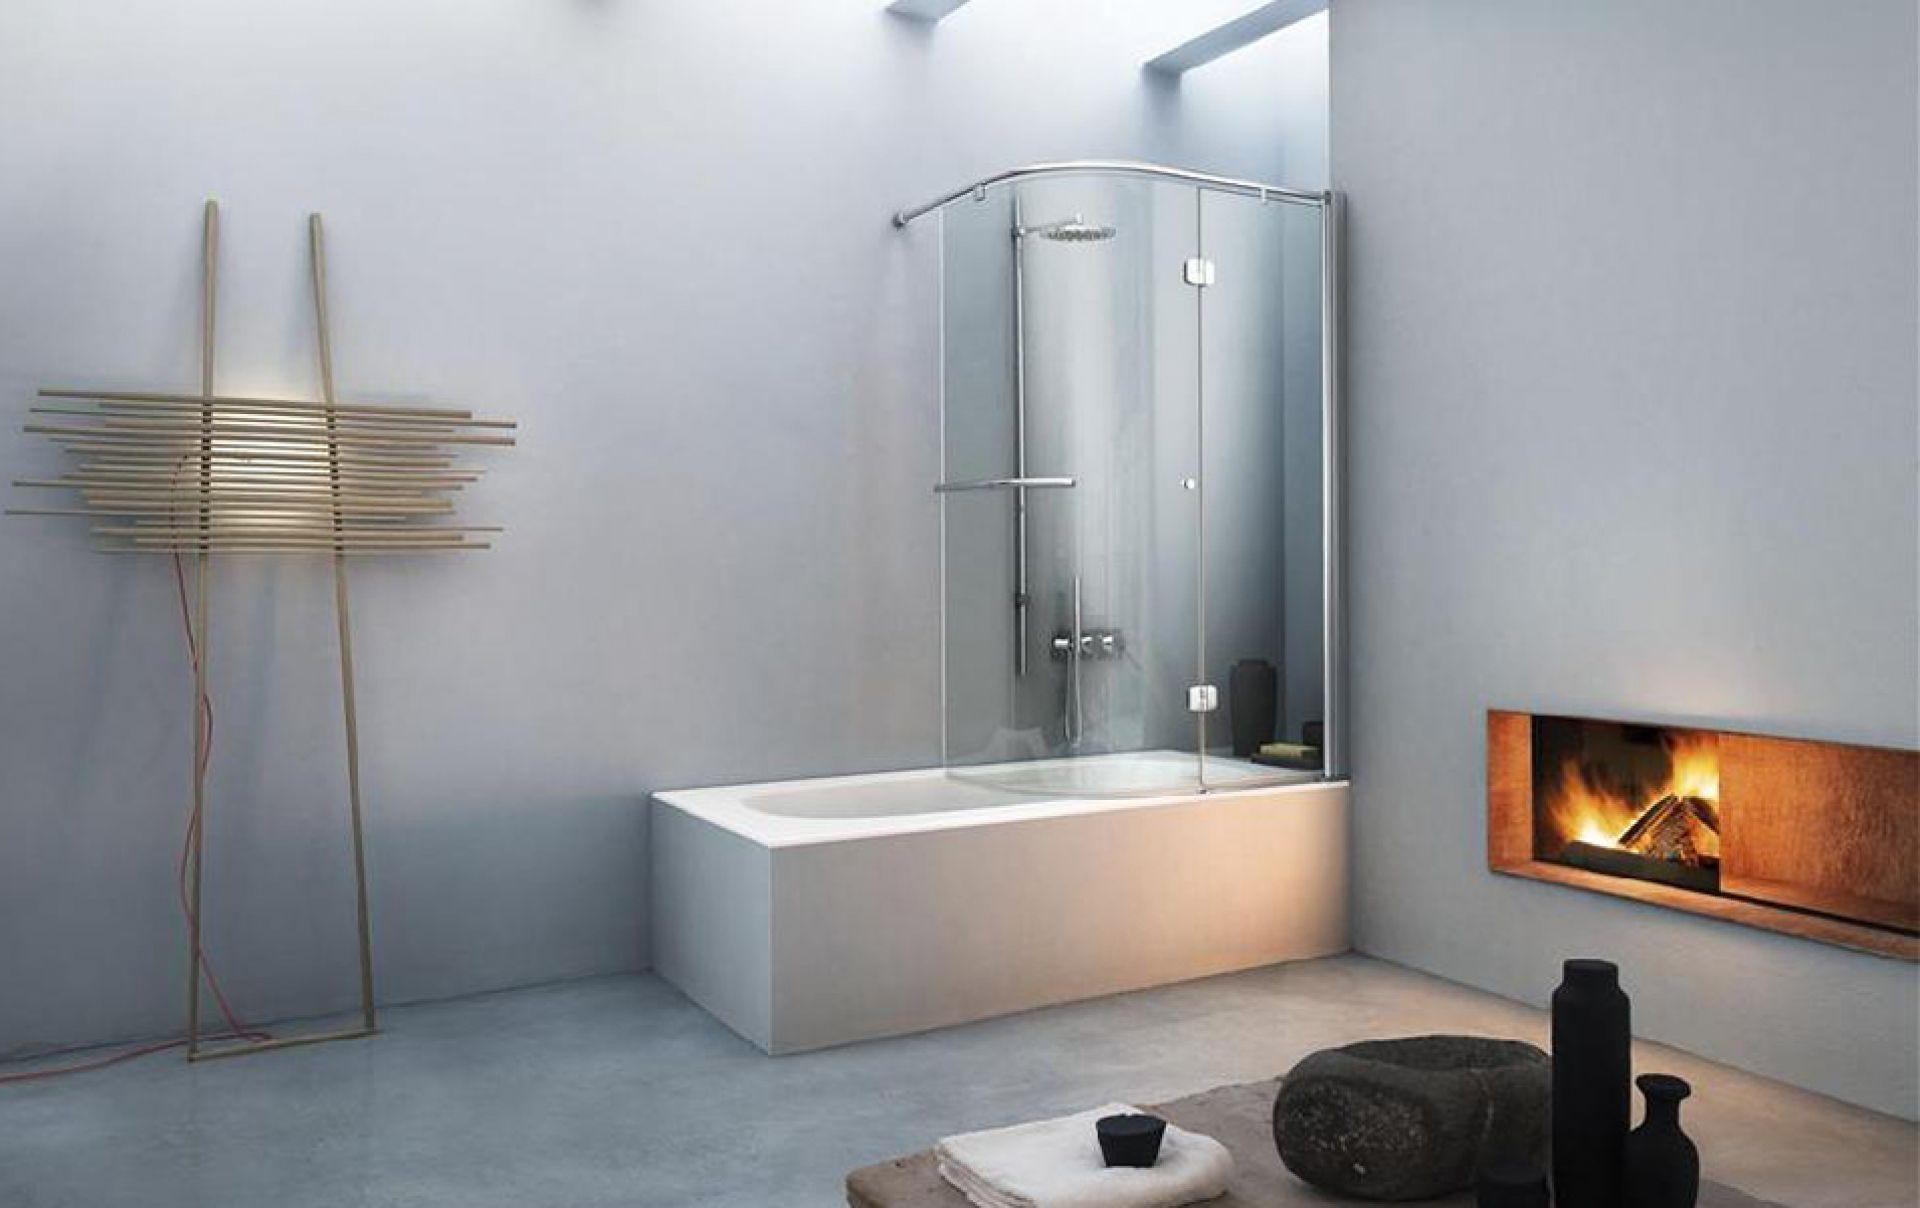 Vasche da bagno bergamo abc interni - Vasche da bagno immagini ...